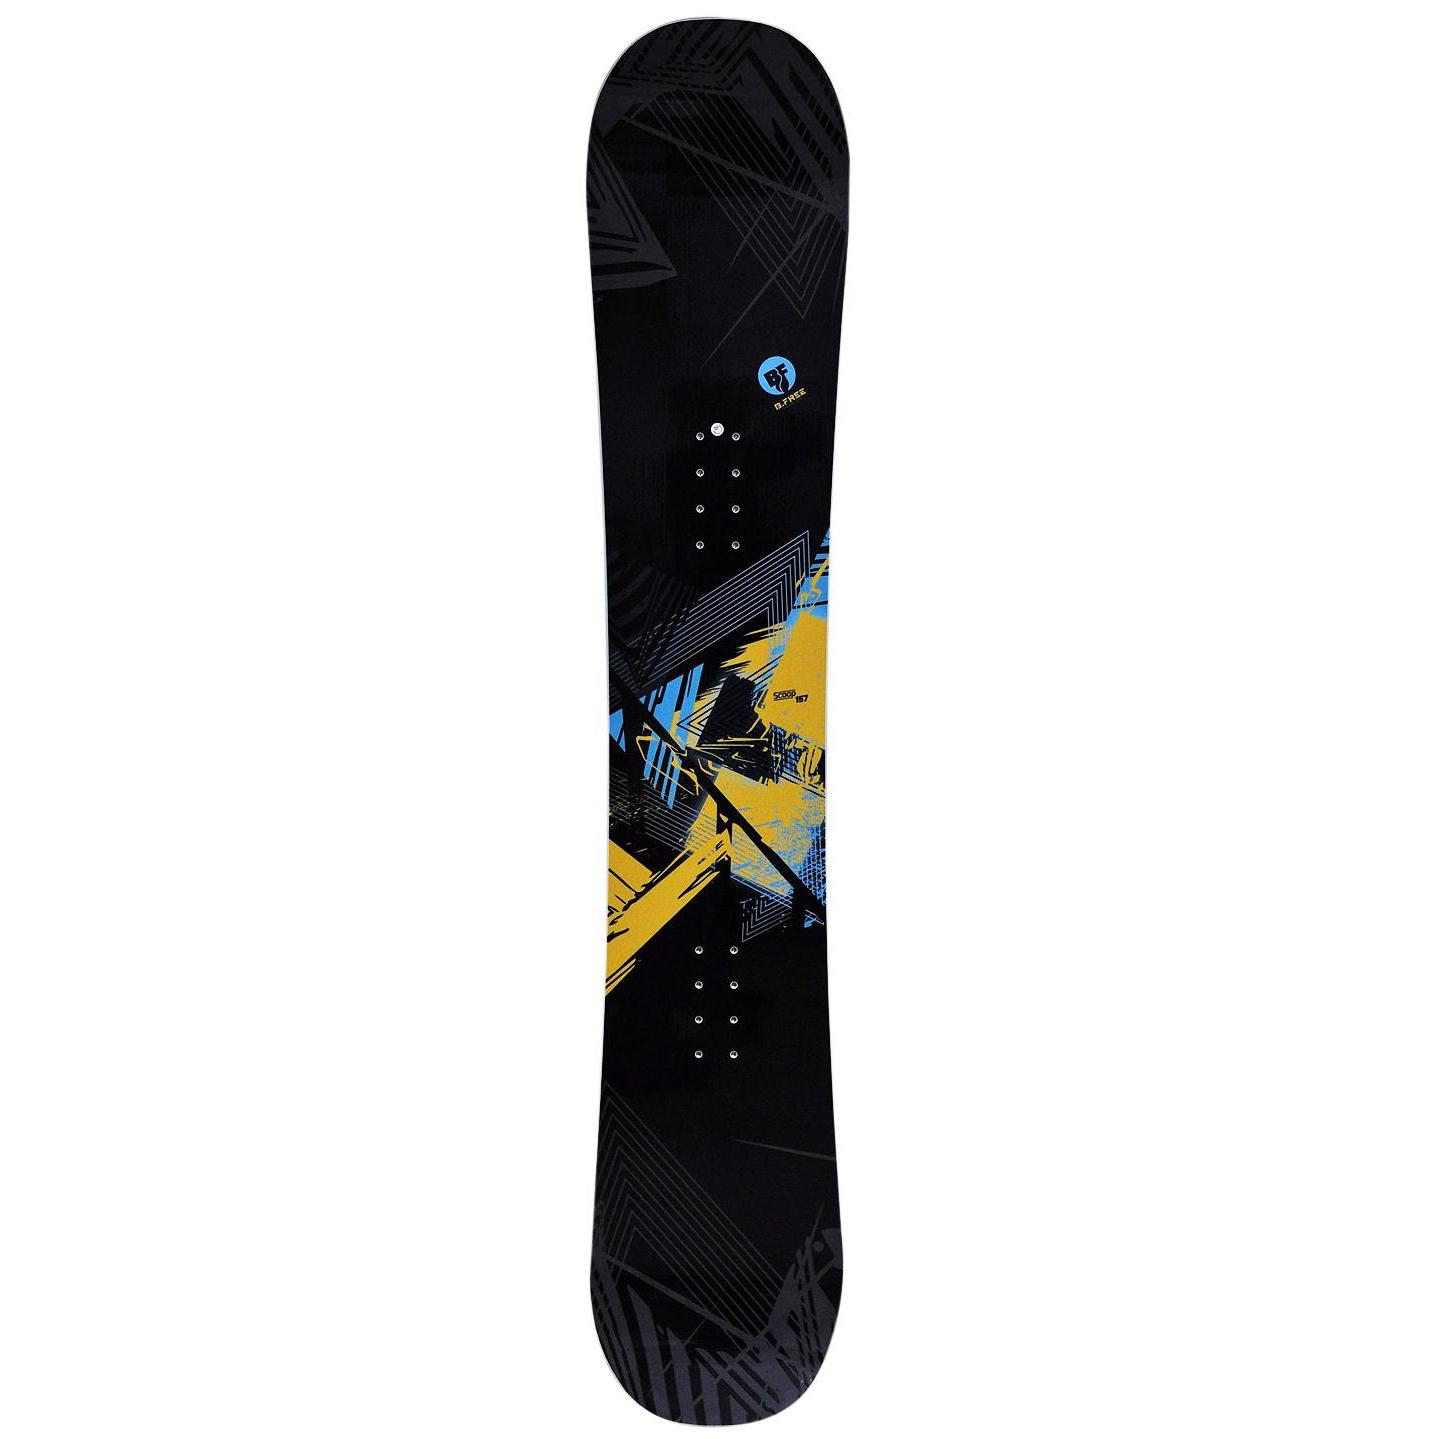 Сноуборд BF snowboards Scoop 2019, 166 см